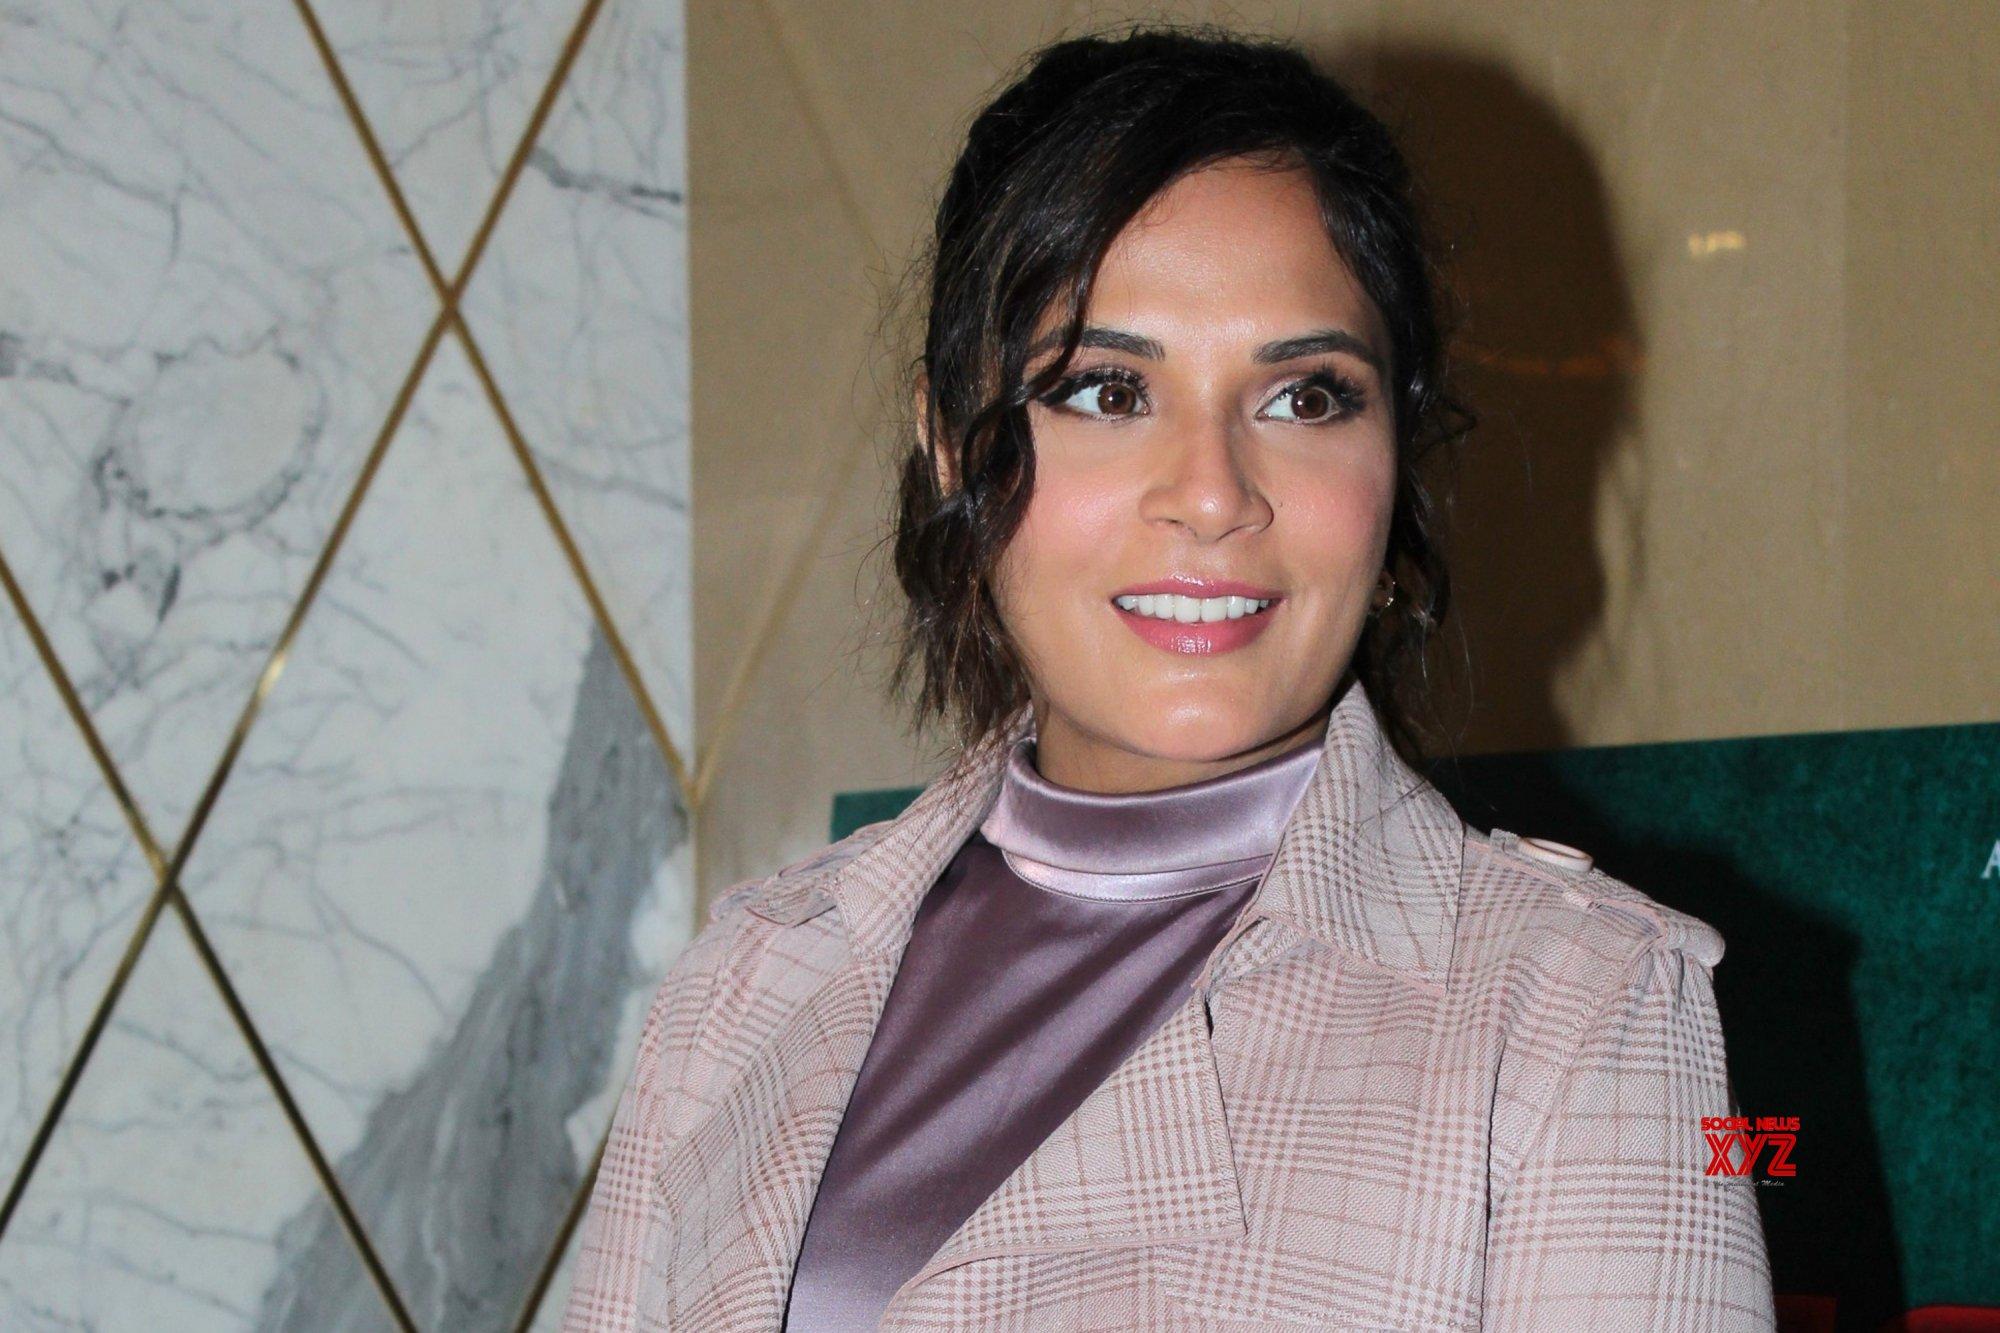 Richa Chadha attacks hotel for holding elderly couple 'captive'